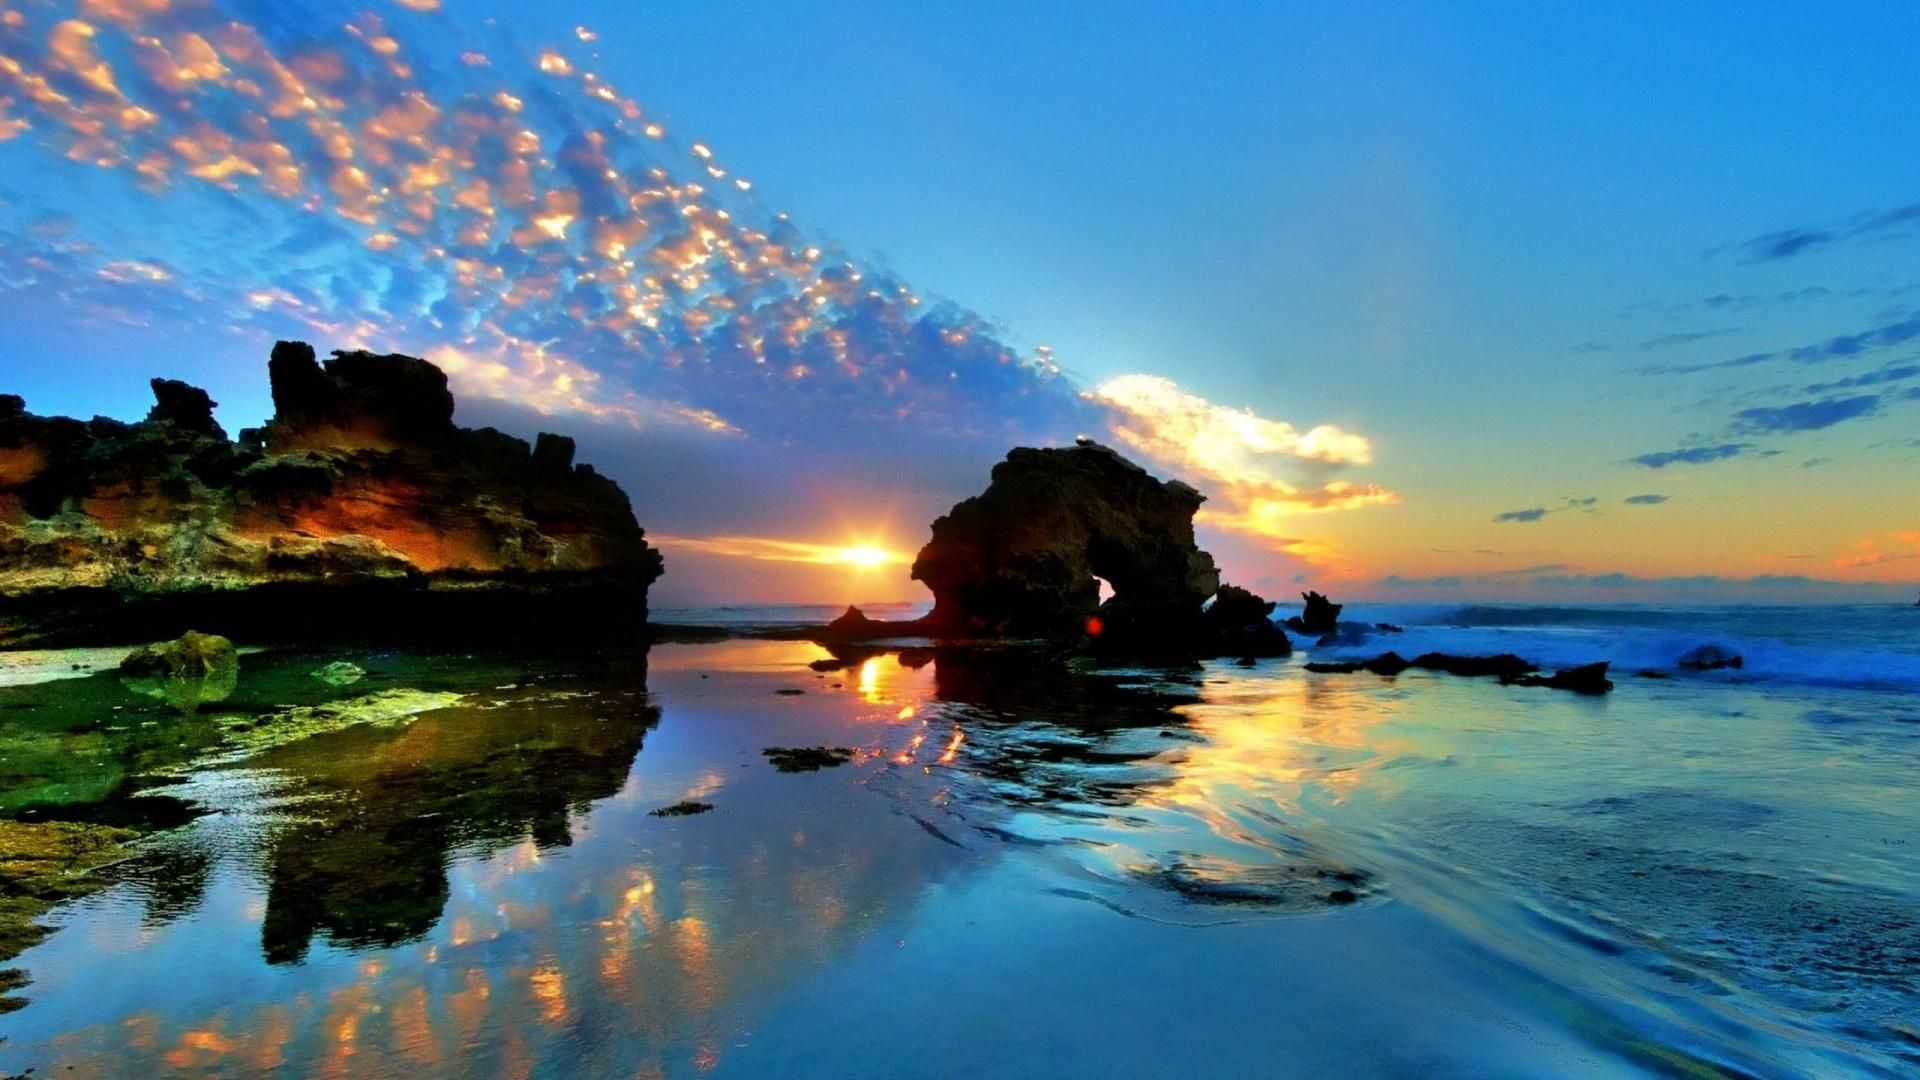 Australia Peninsula Sydney Pirriwee   HD Sunrise On Mornington Peninsula Australia Wallpaper ...